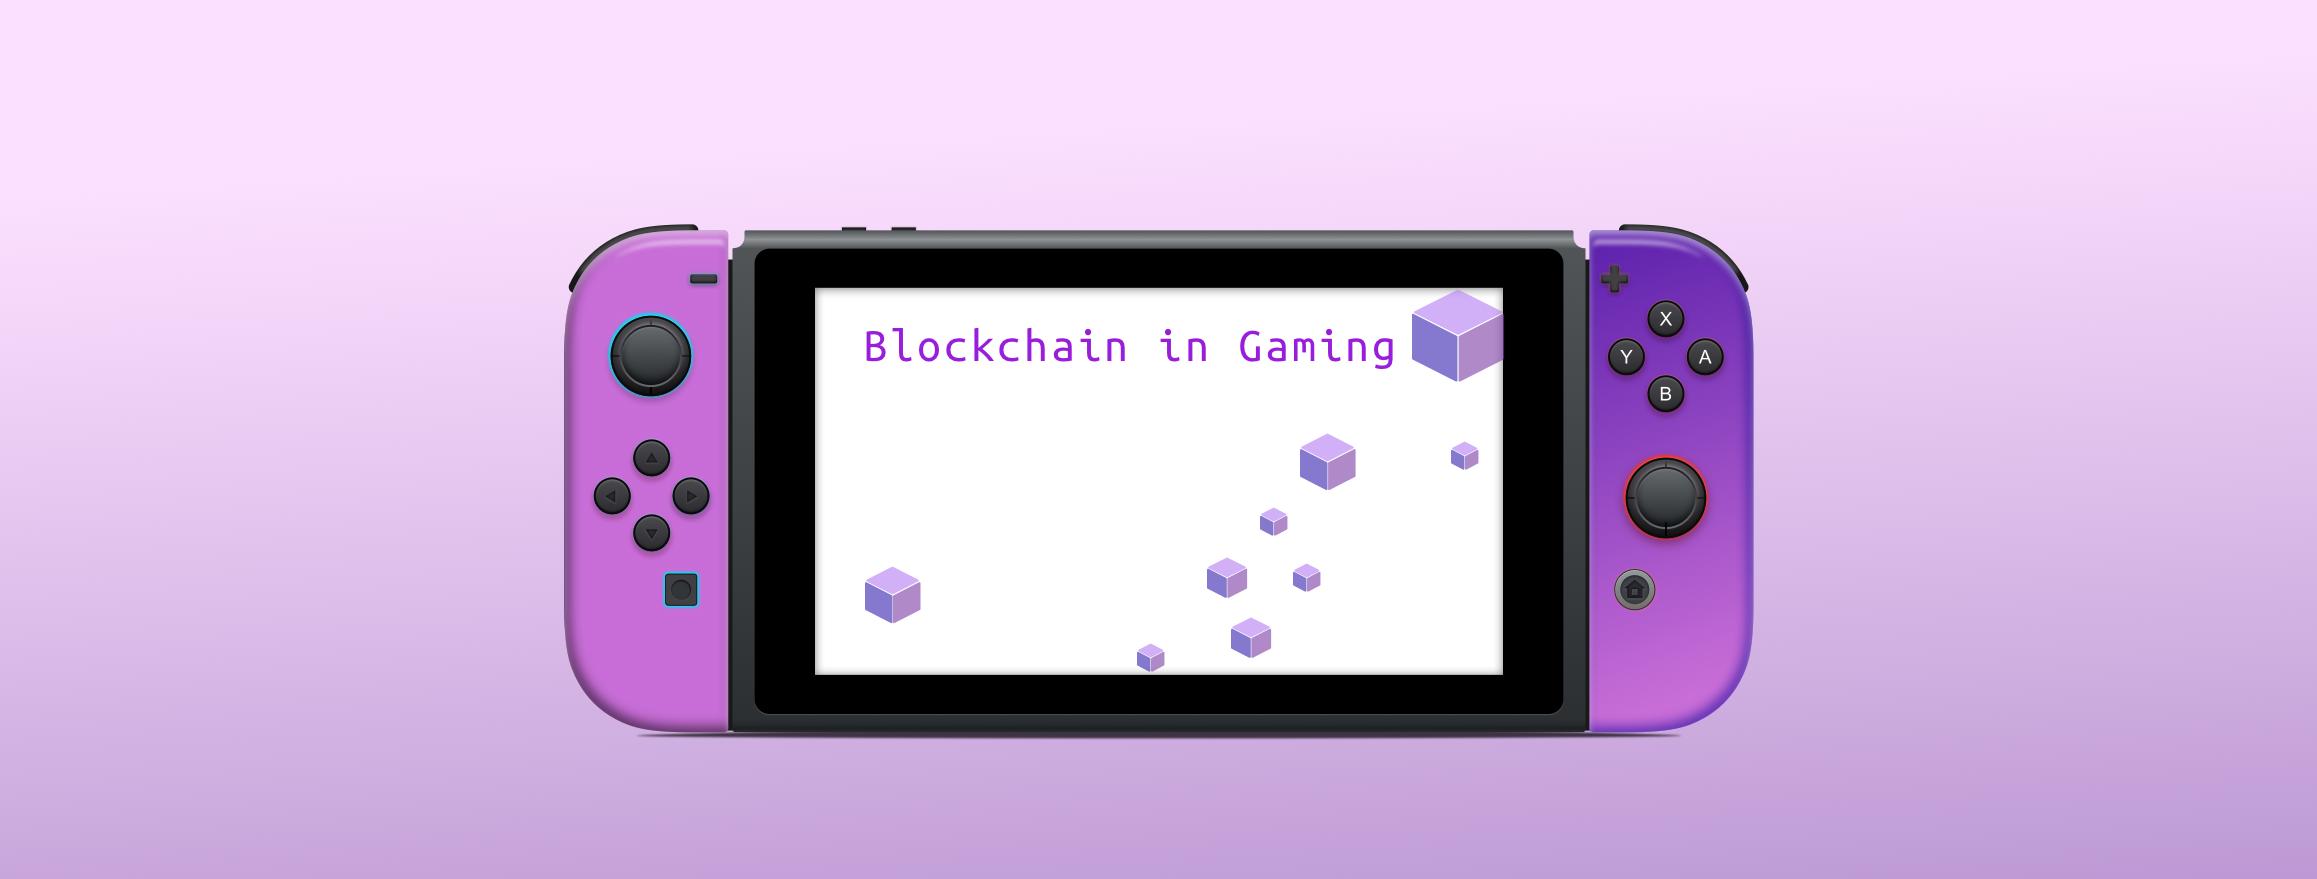 Blockchain in Gaming | Best Blockchain Use Cases